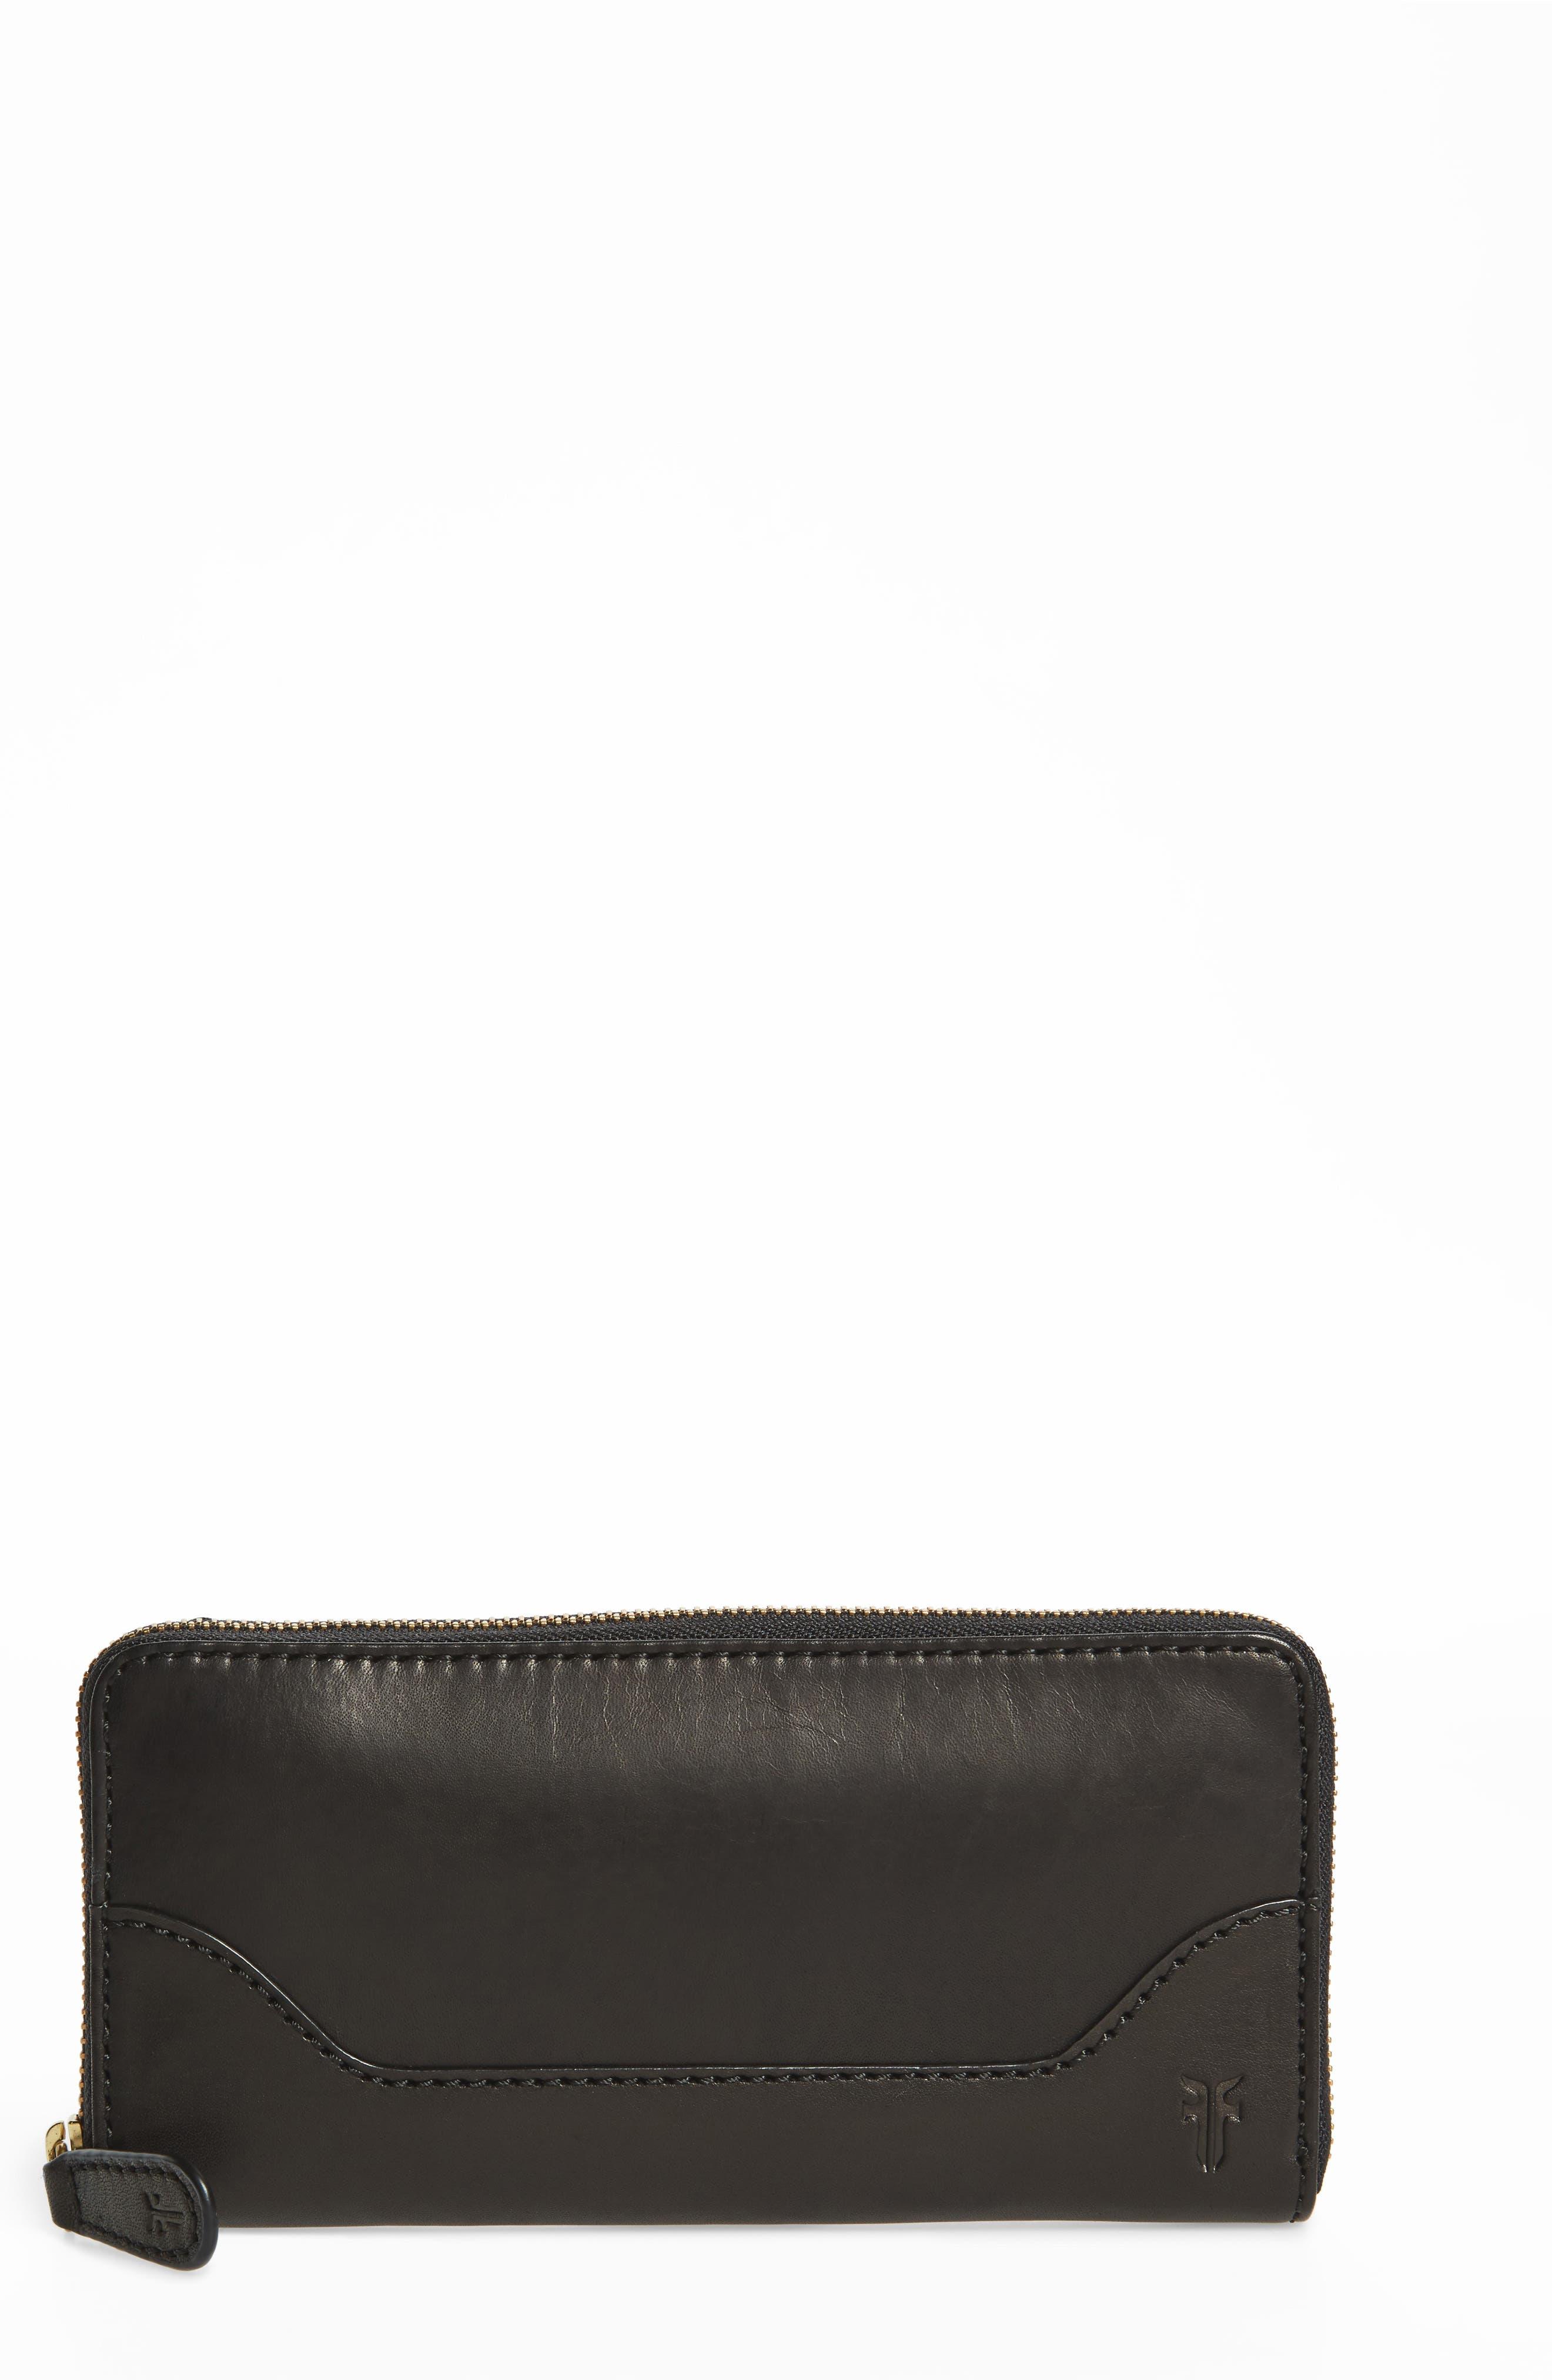 Frye Melissa Leather Zip Wallet